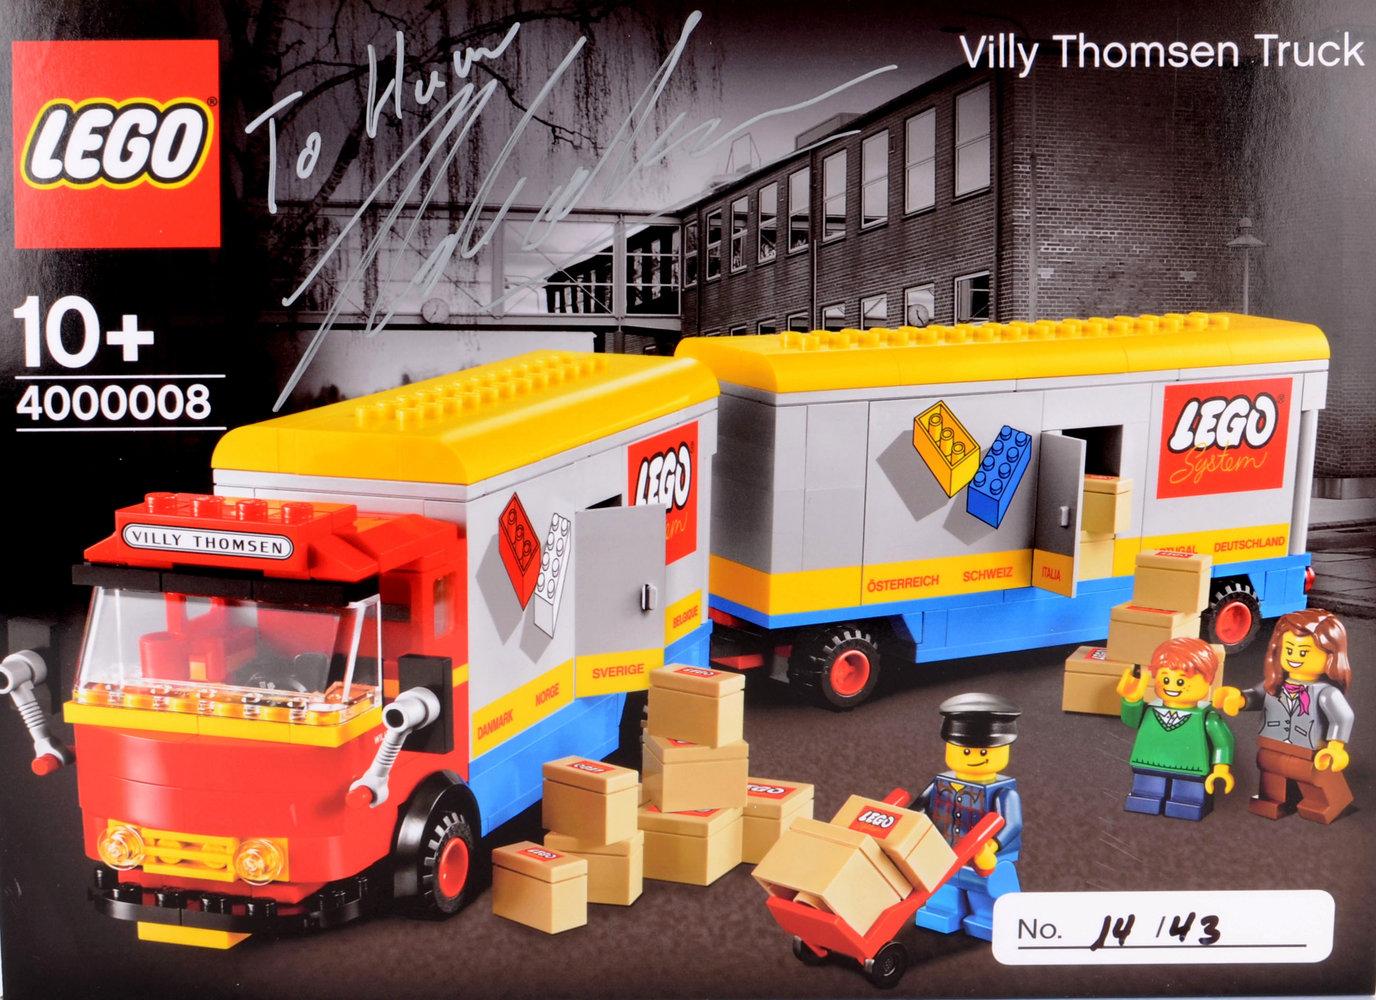 Villy Thomsen Truck